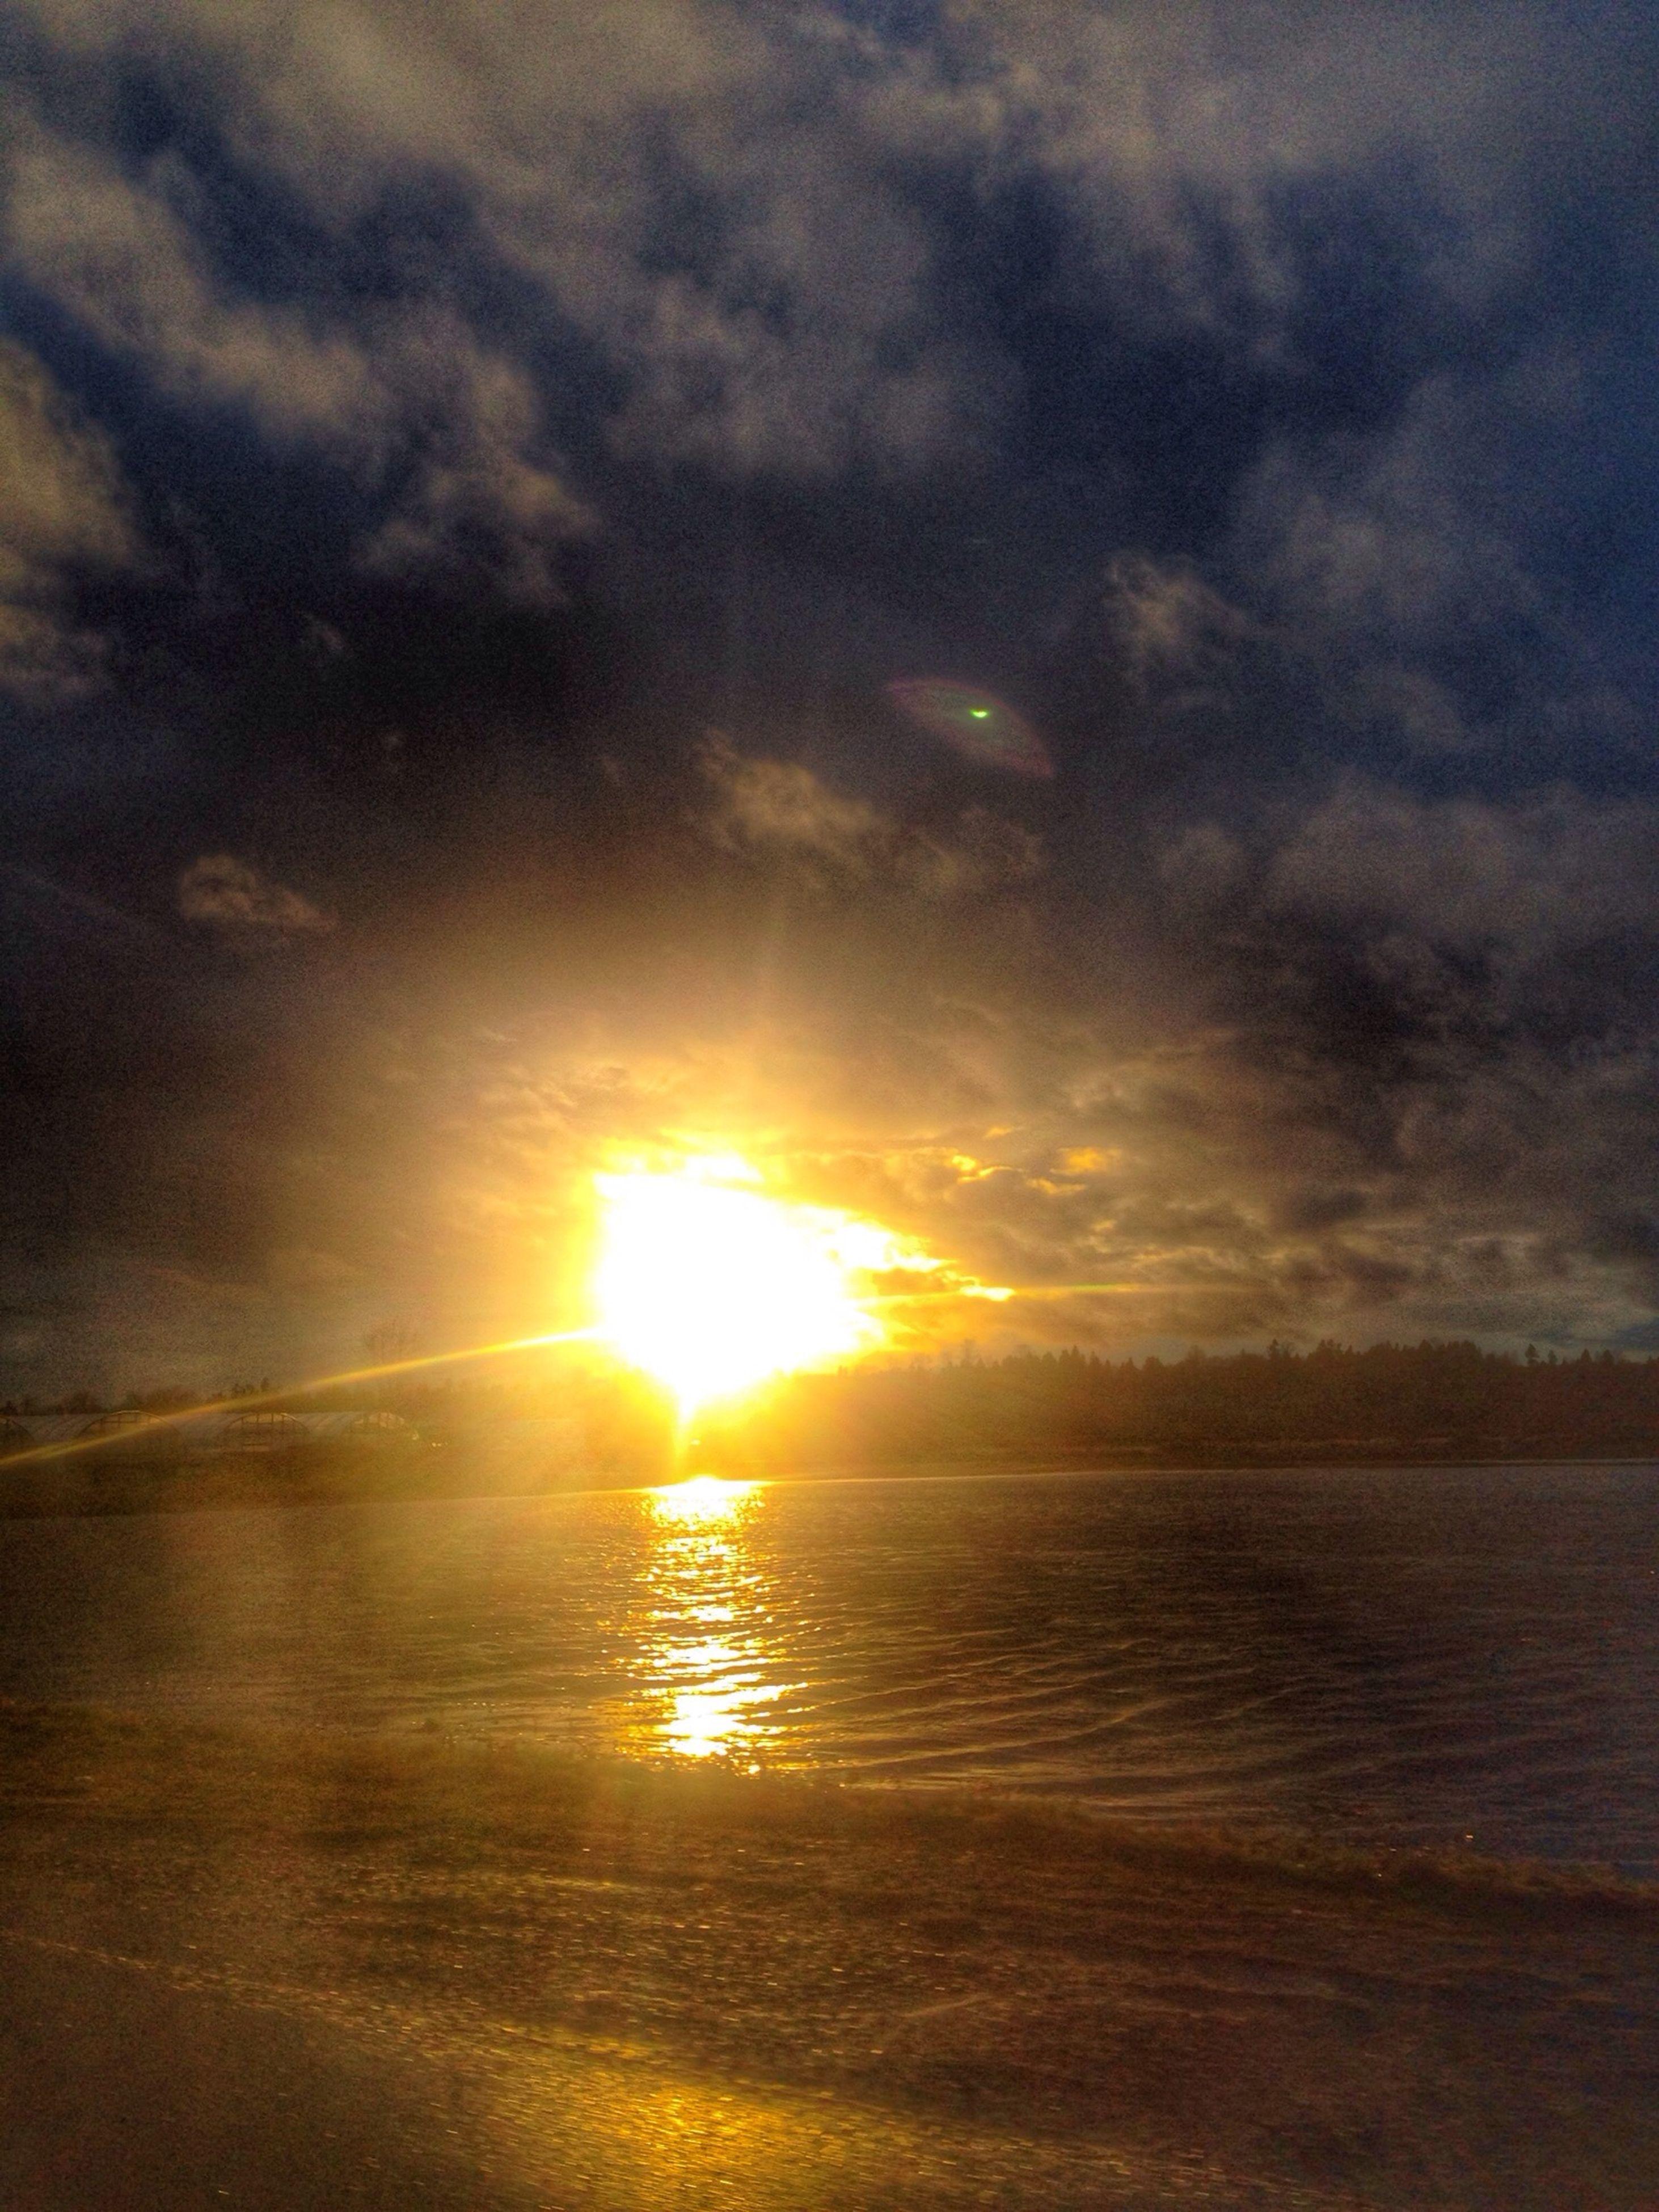 sunset, water, scenics, tranquil scene, beauty in nature, tranquility, sun, sea, sky, reflection, idyllic, cloud - sky, nature, horizon over water, beach, orange color, waterfront, sunlight, cloudy, sunbeam